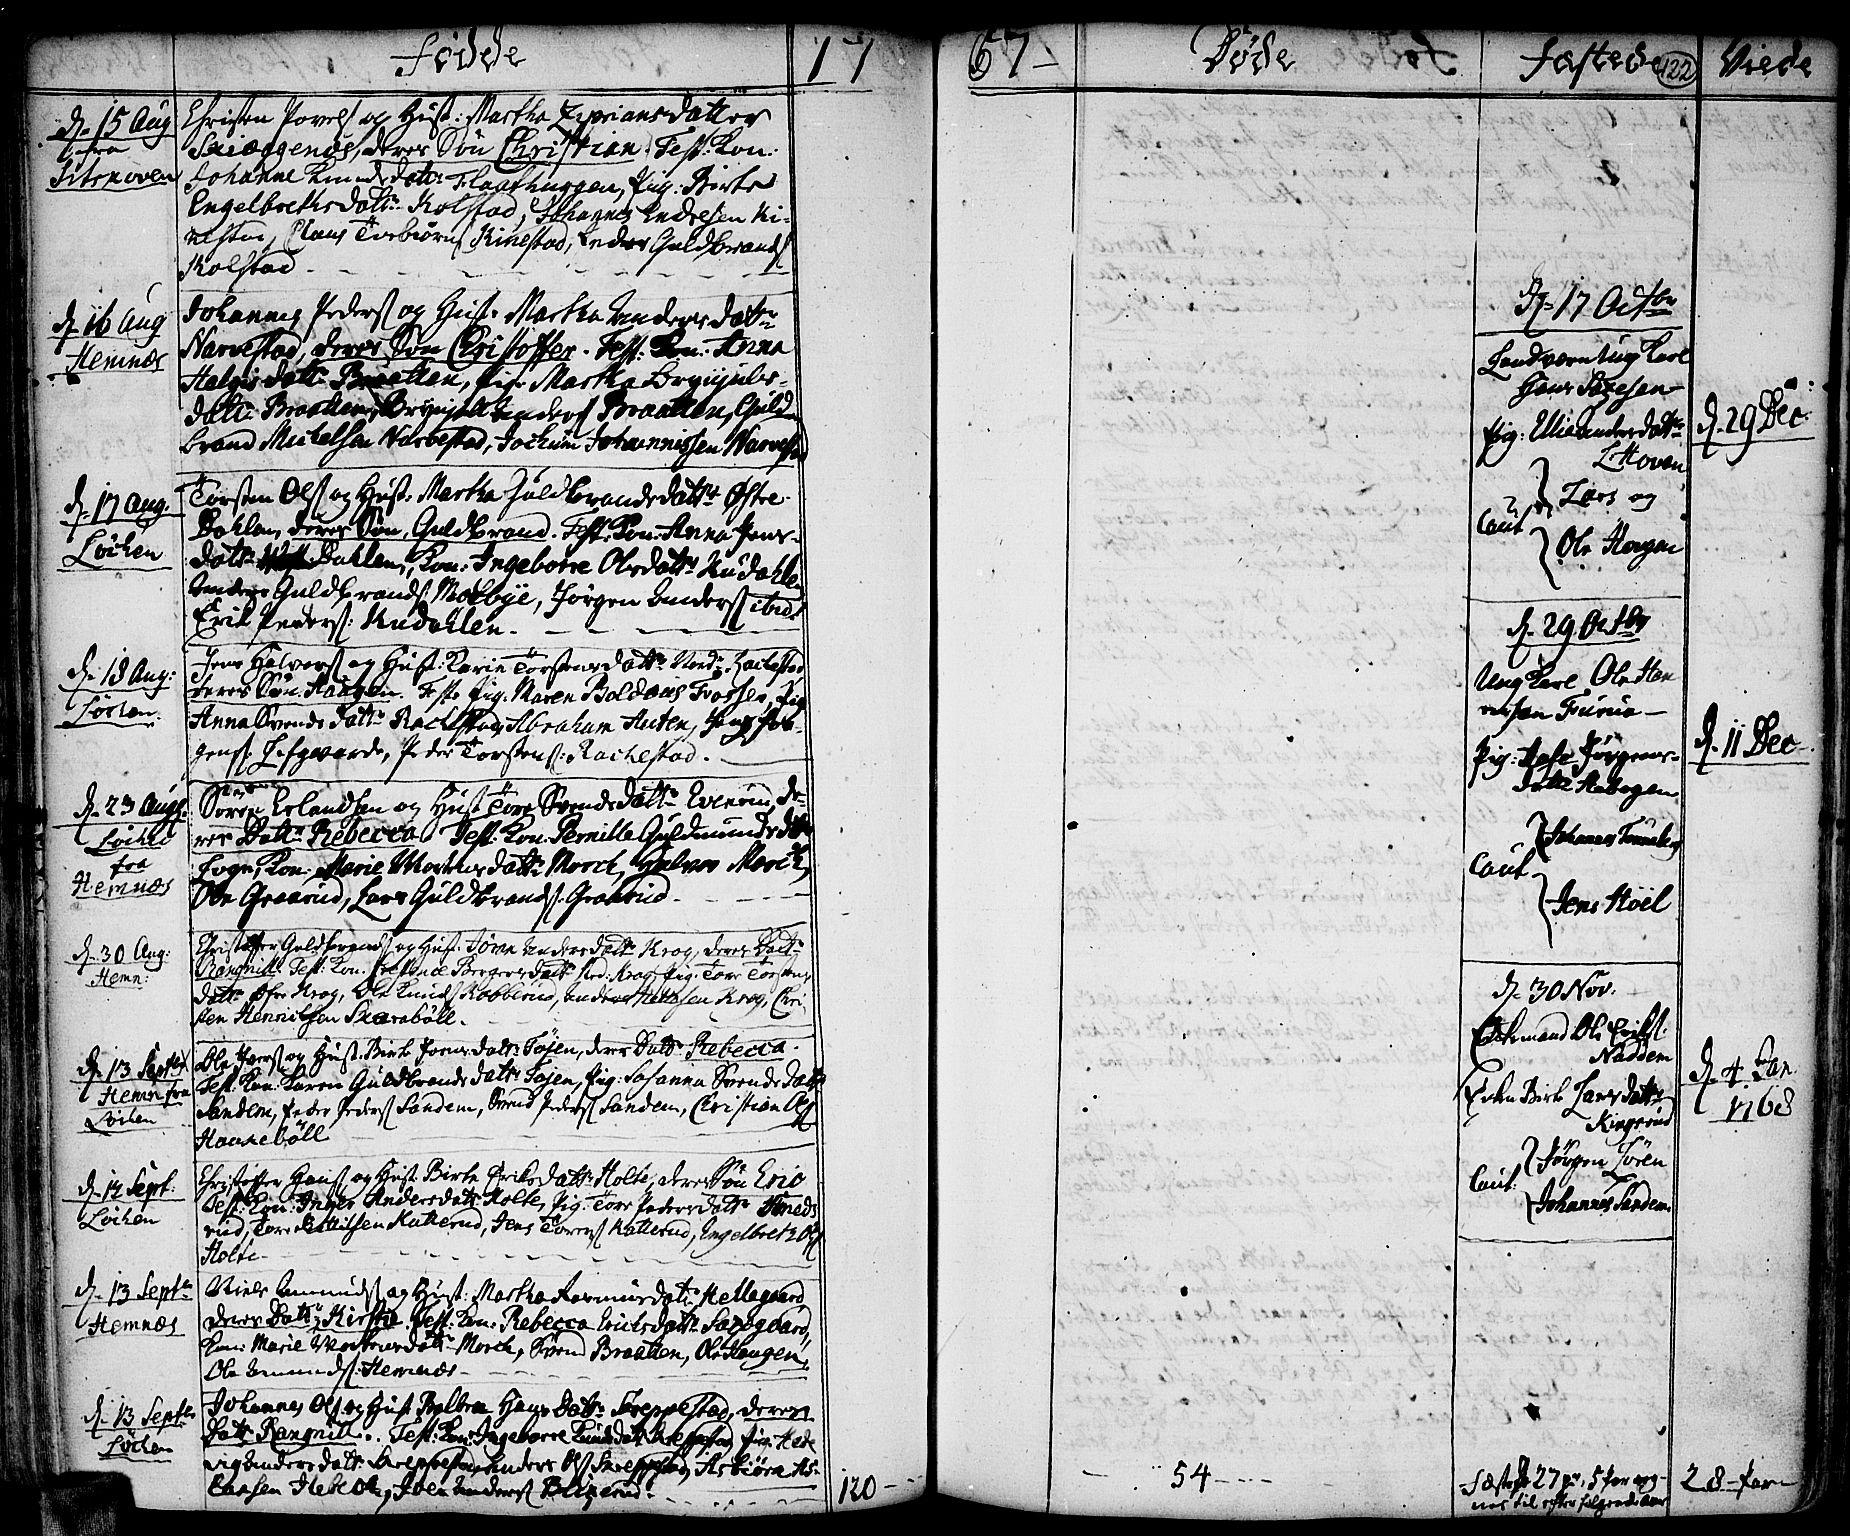 SAO, Høland prestekontor Kirkebøker, F/Fa/L0004: Ministerialbok nr. I 4, 1757-1780, s. 122